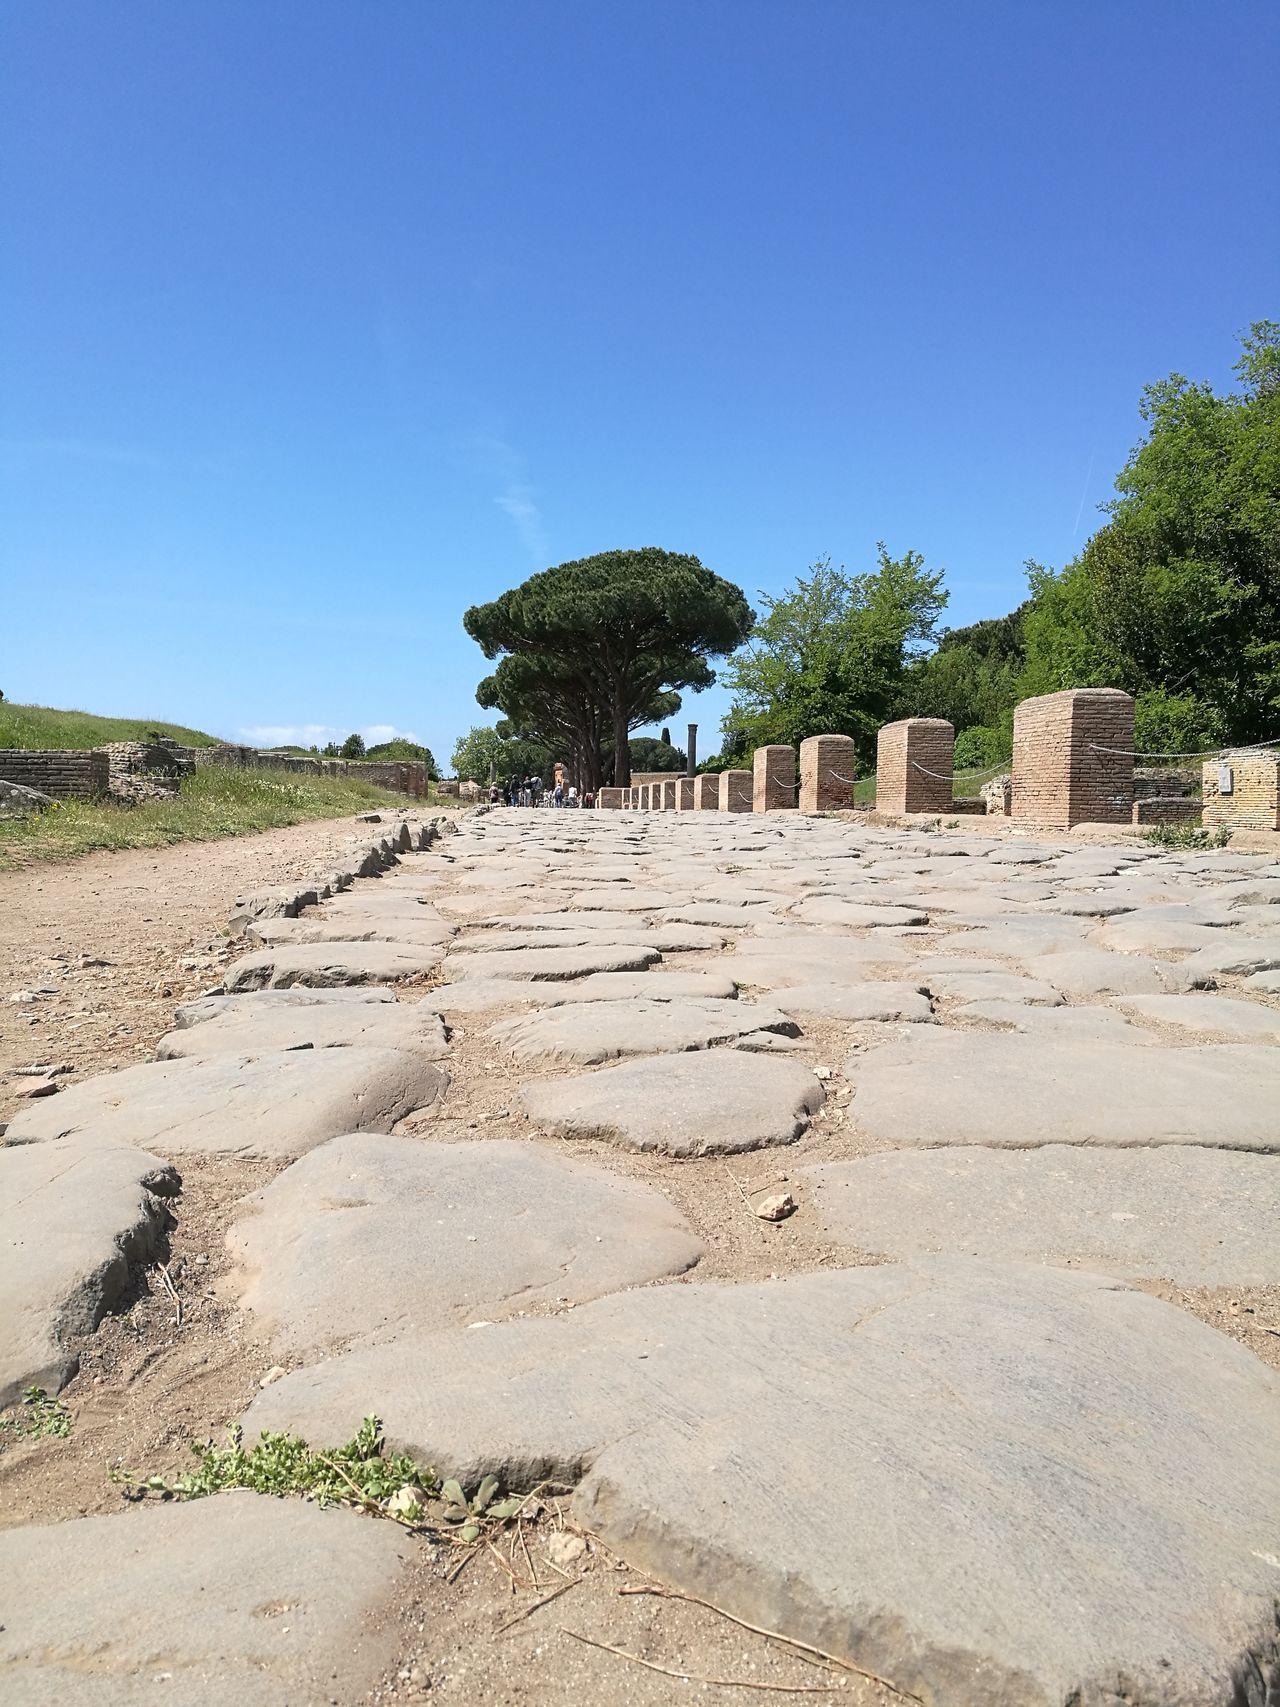 Beautiful Italy🇮🇹 Ancient Civilization Beautiful Rome Roman Architecture History Rome Italy🇮🇹